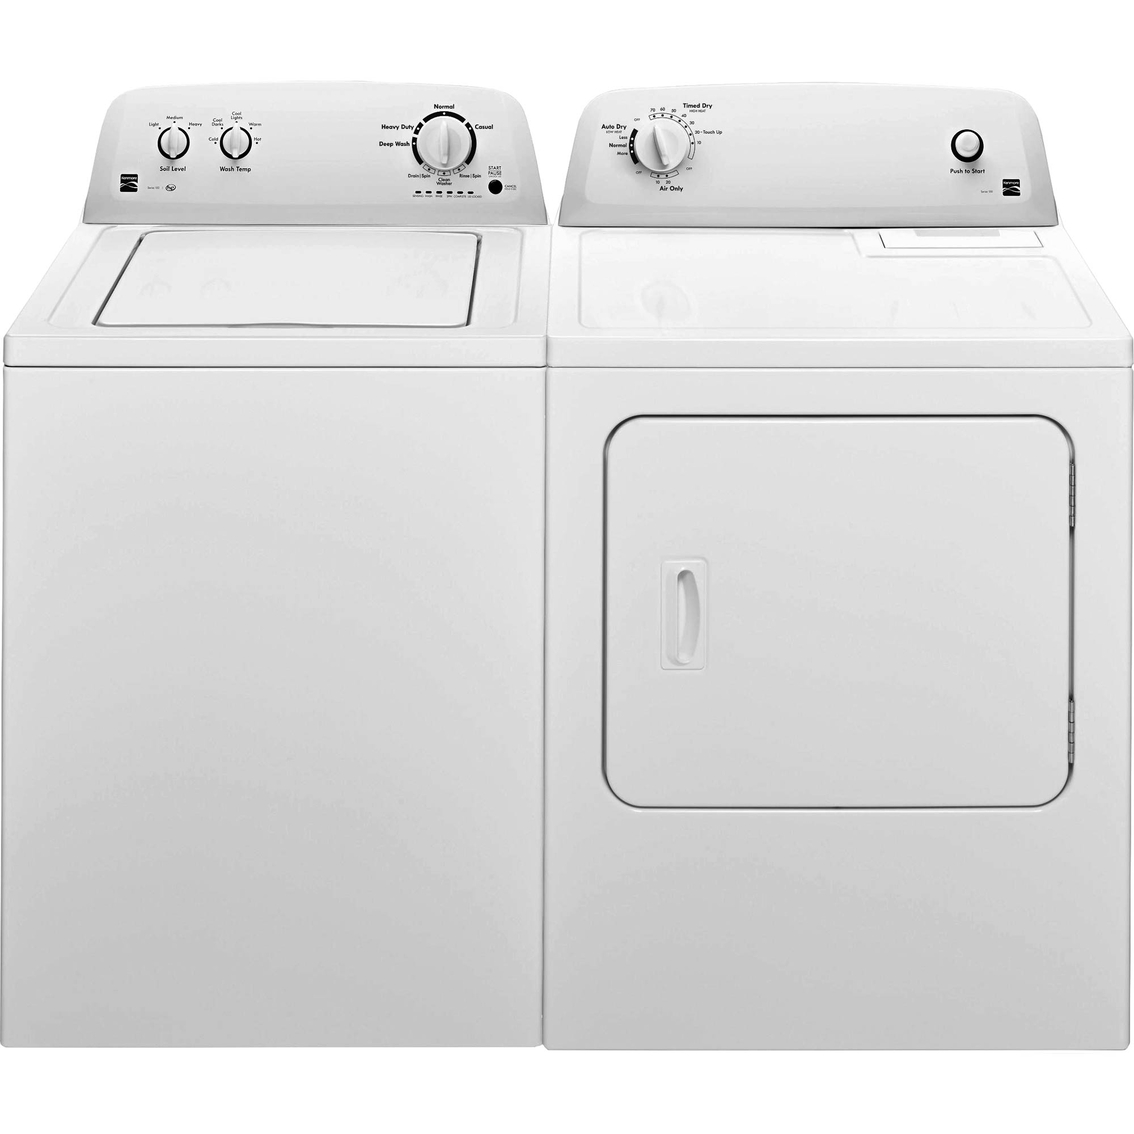 kenmore 800 washer. 3550 kenmore 800 washer